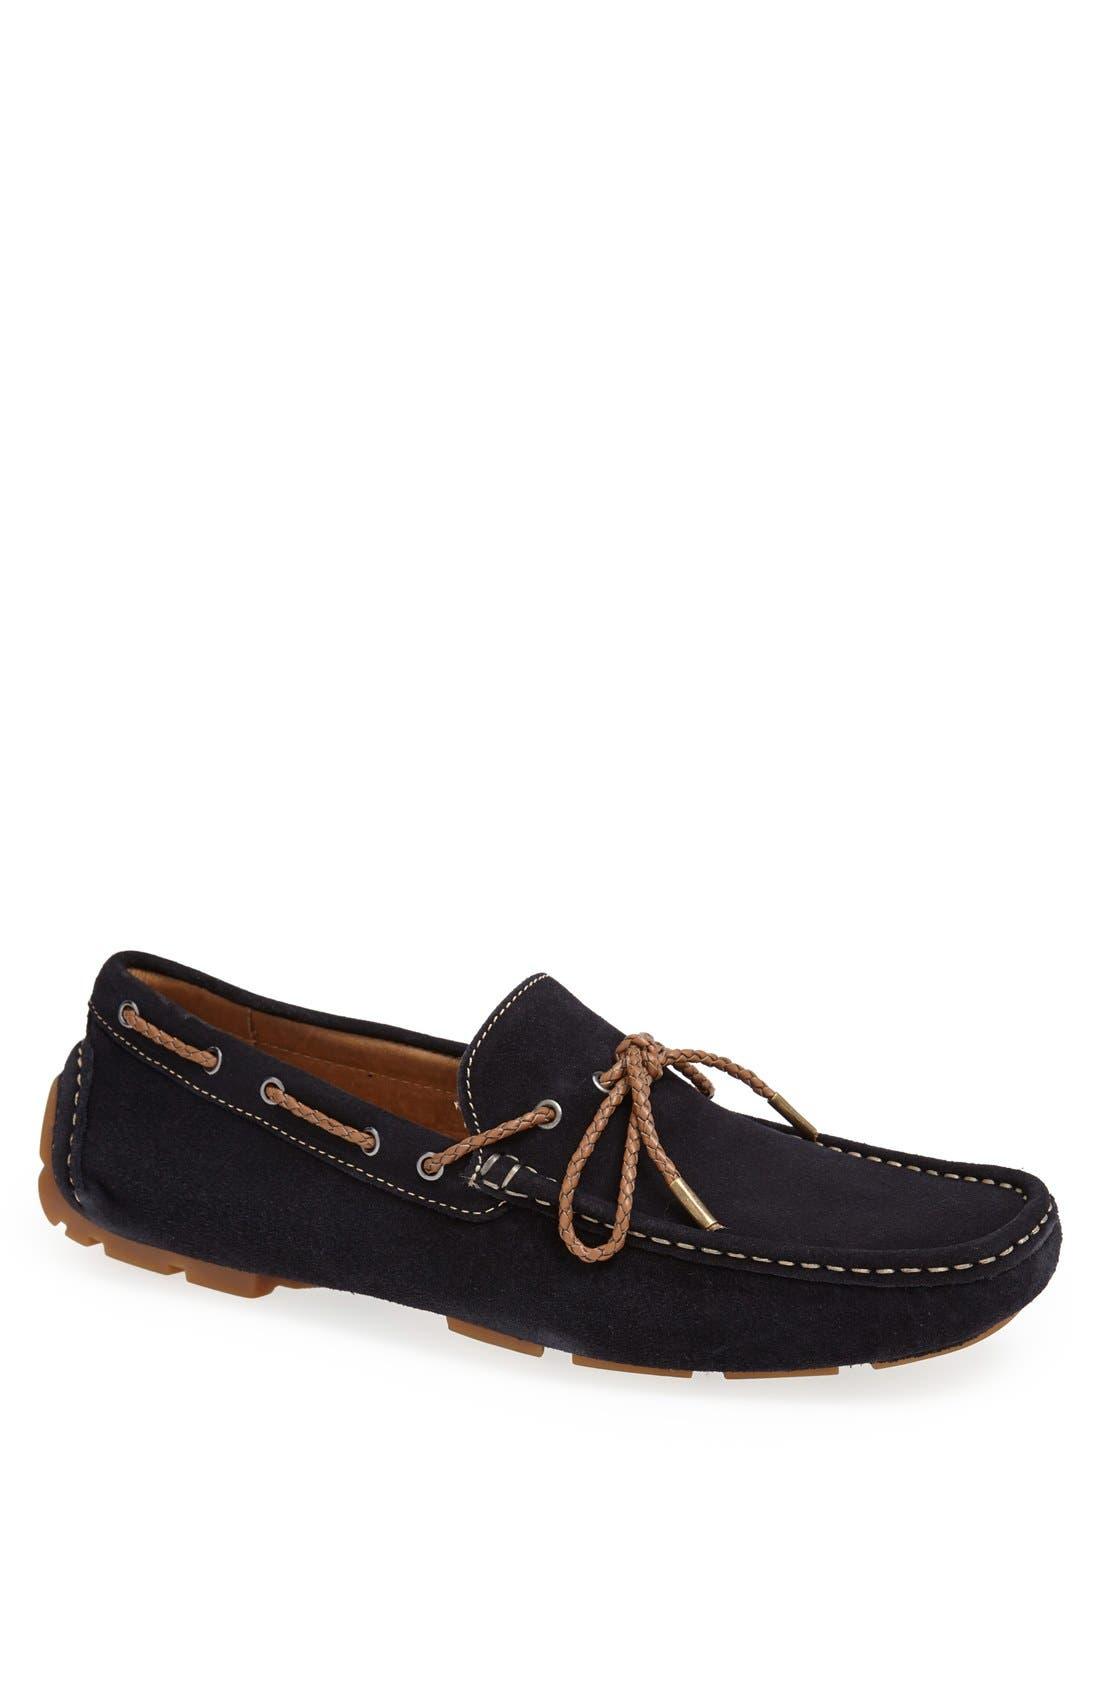 Alternate Image 1 Selected - 1901 'Braden' Driving Shoe (Men)